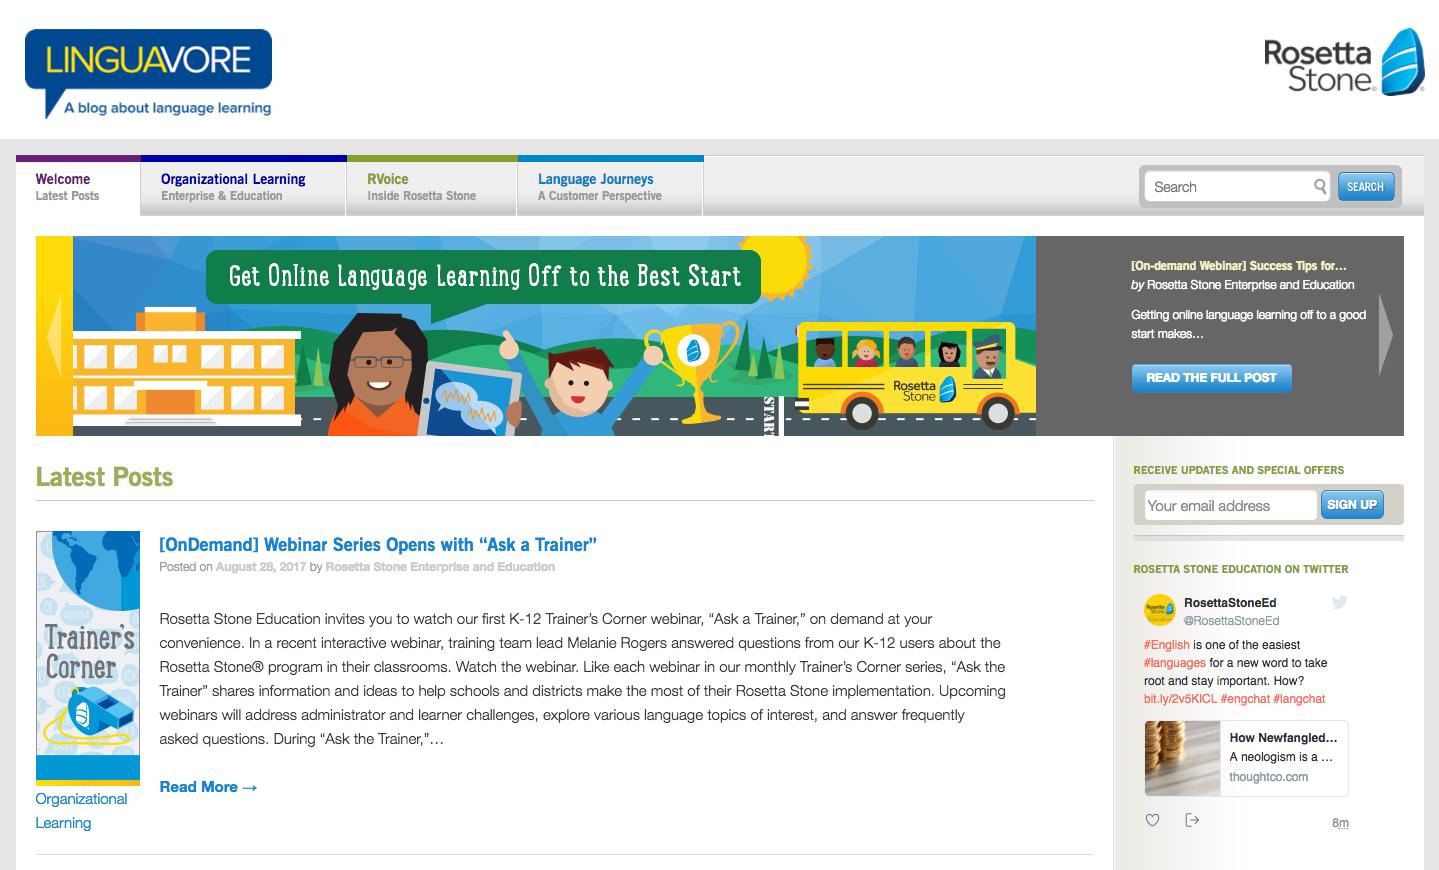 Rosetta Stone Content Marketing Brands